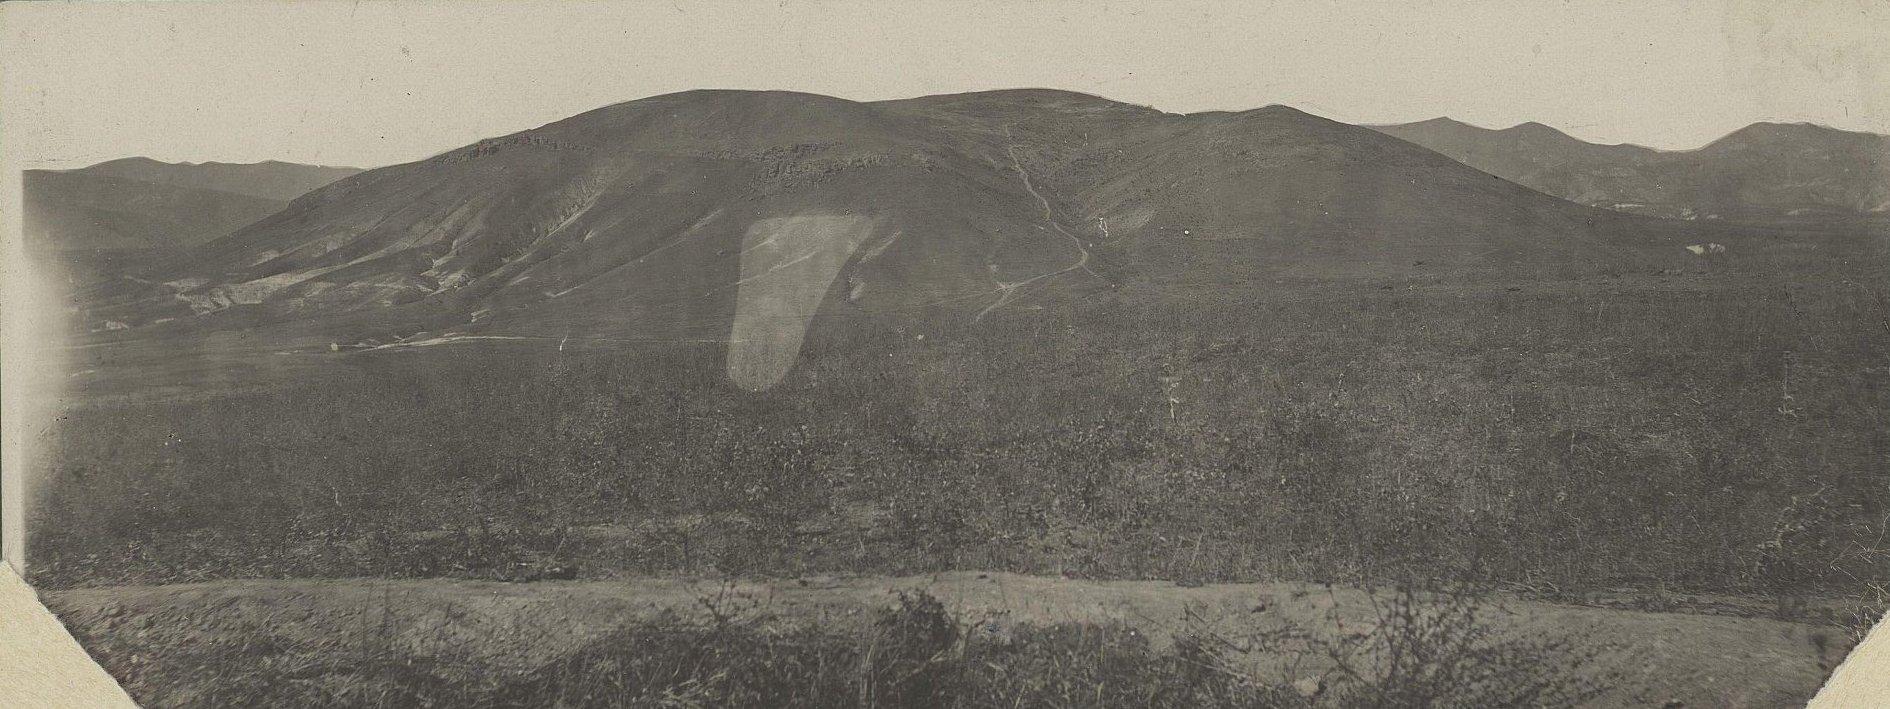 1915. Панорама Галицийских гор